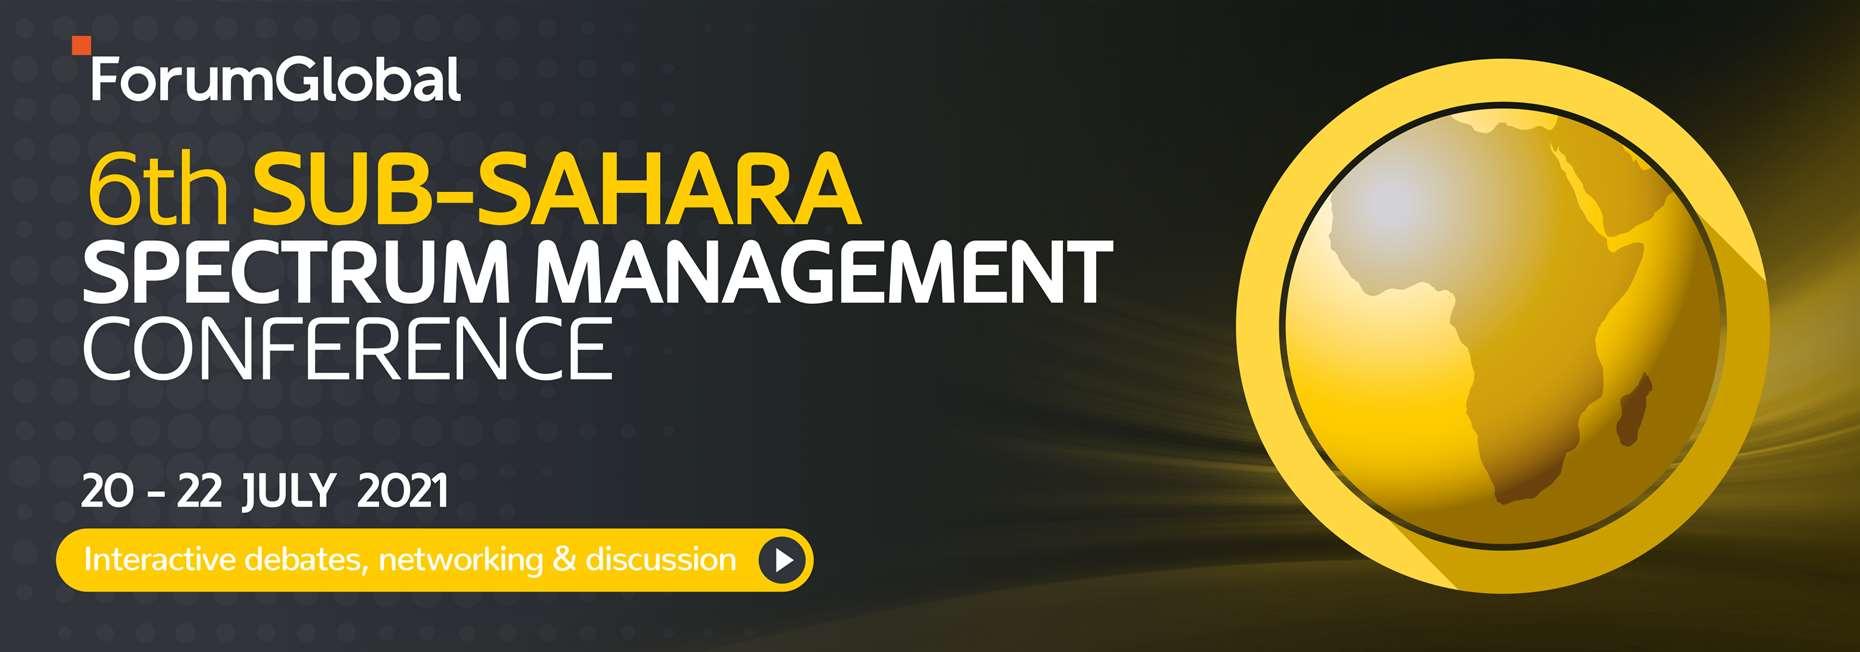 Sub Sahara Spectrum Management Conference Calls for Internet Accessibility